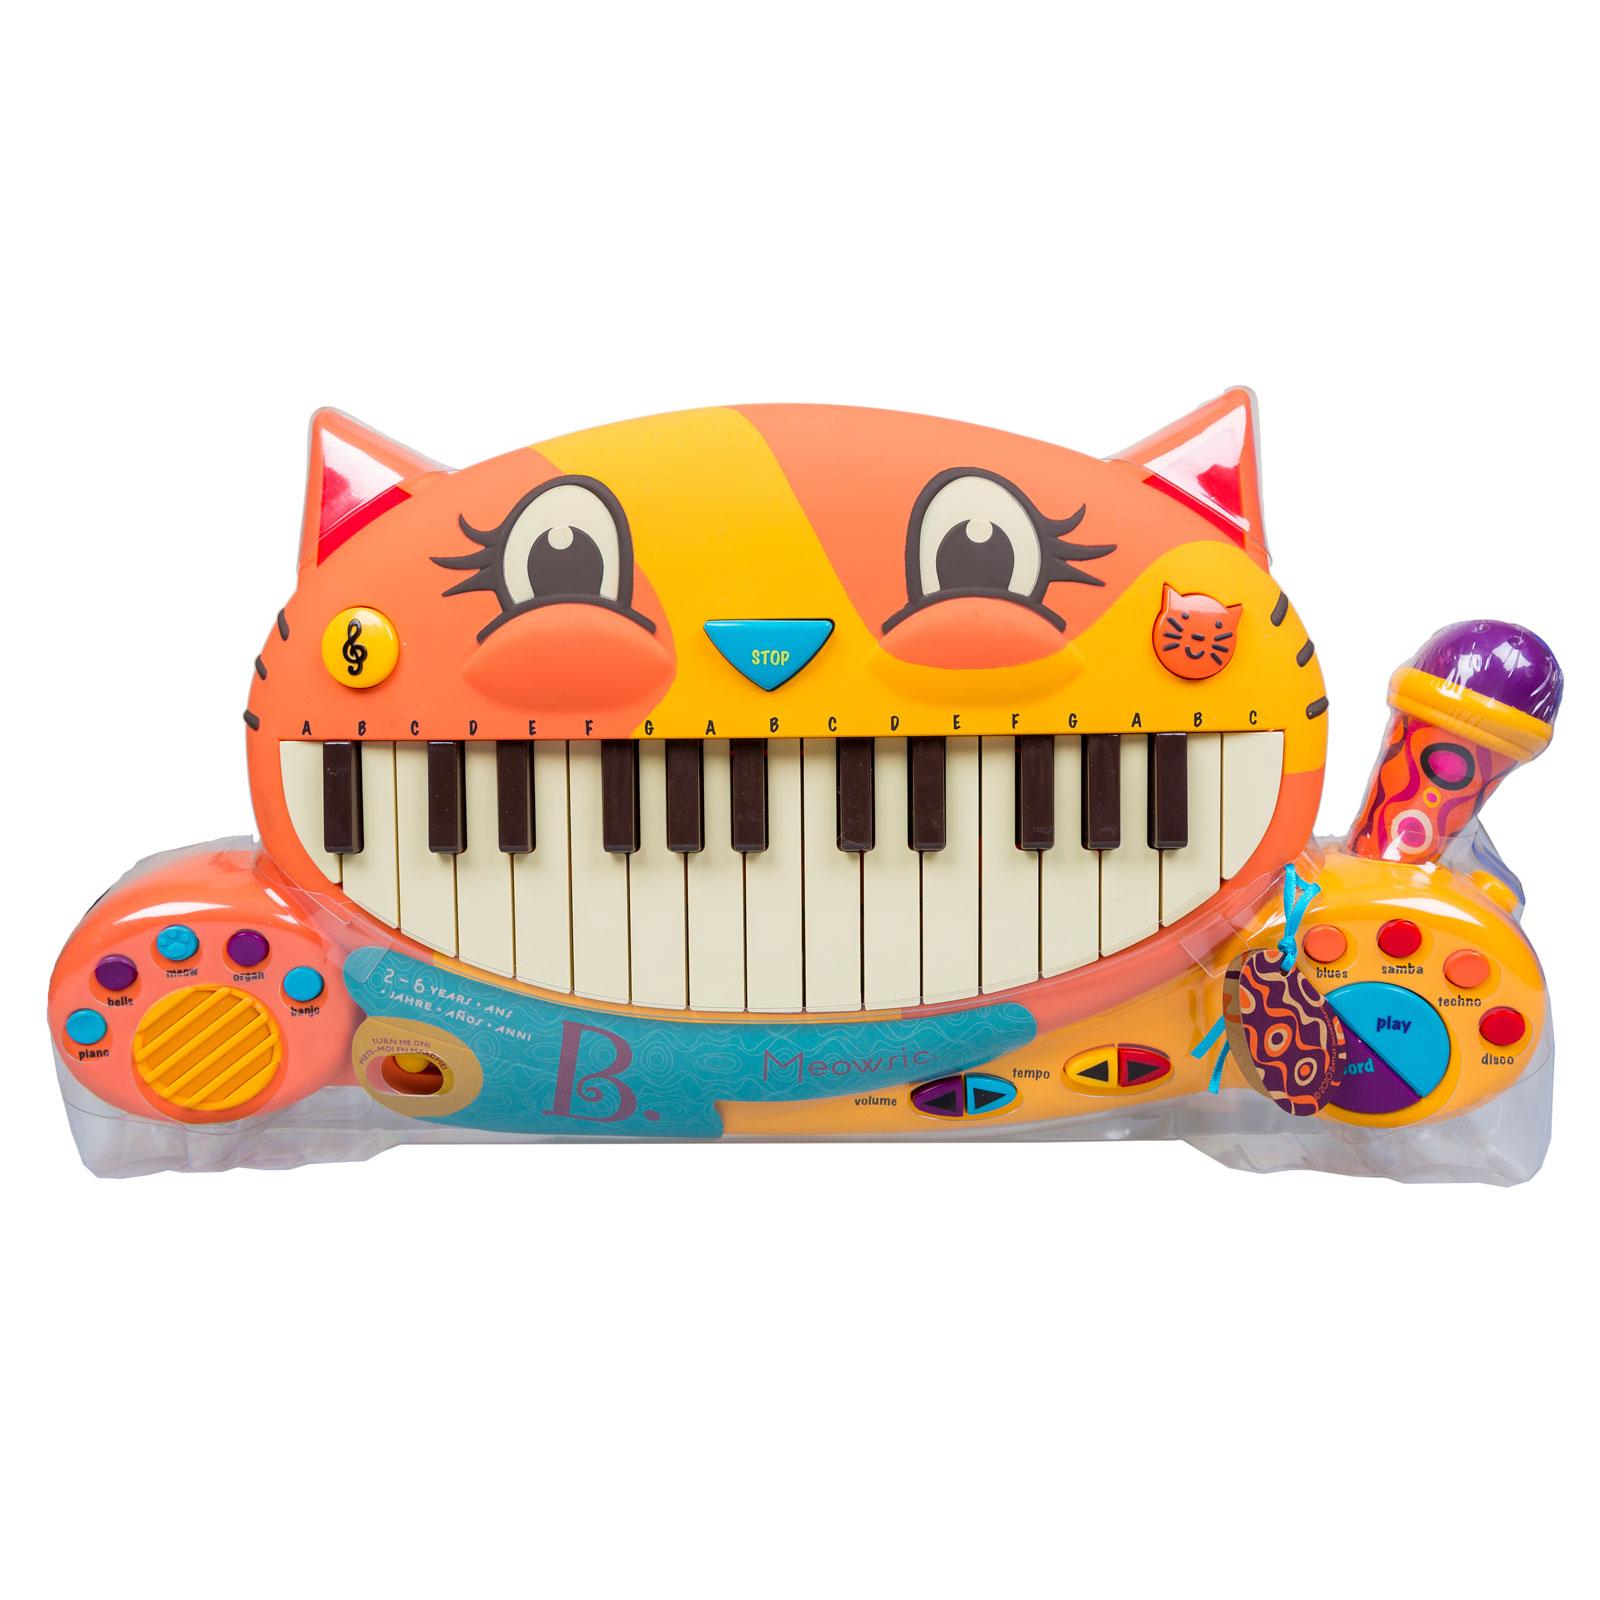 Развивающая игрушка B Dot Мини-пианино Meowsic от 2 лет.<br>